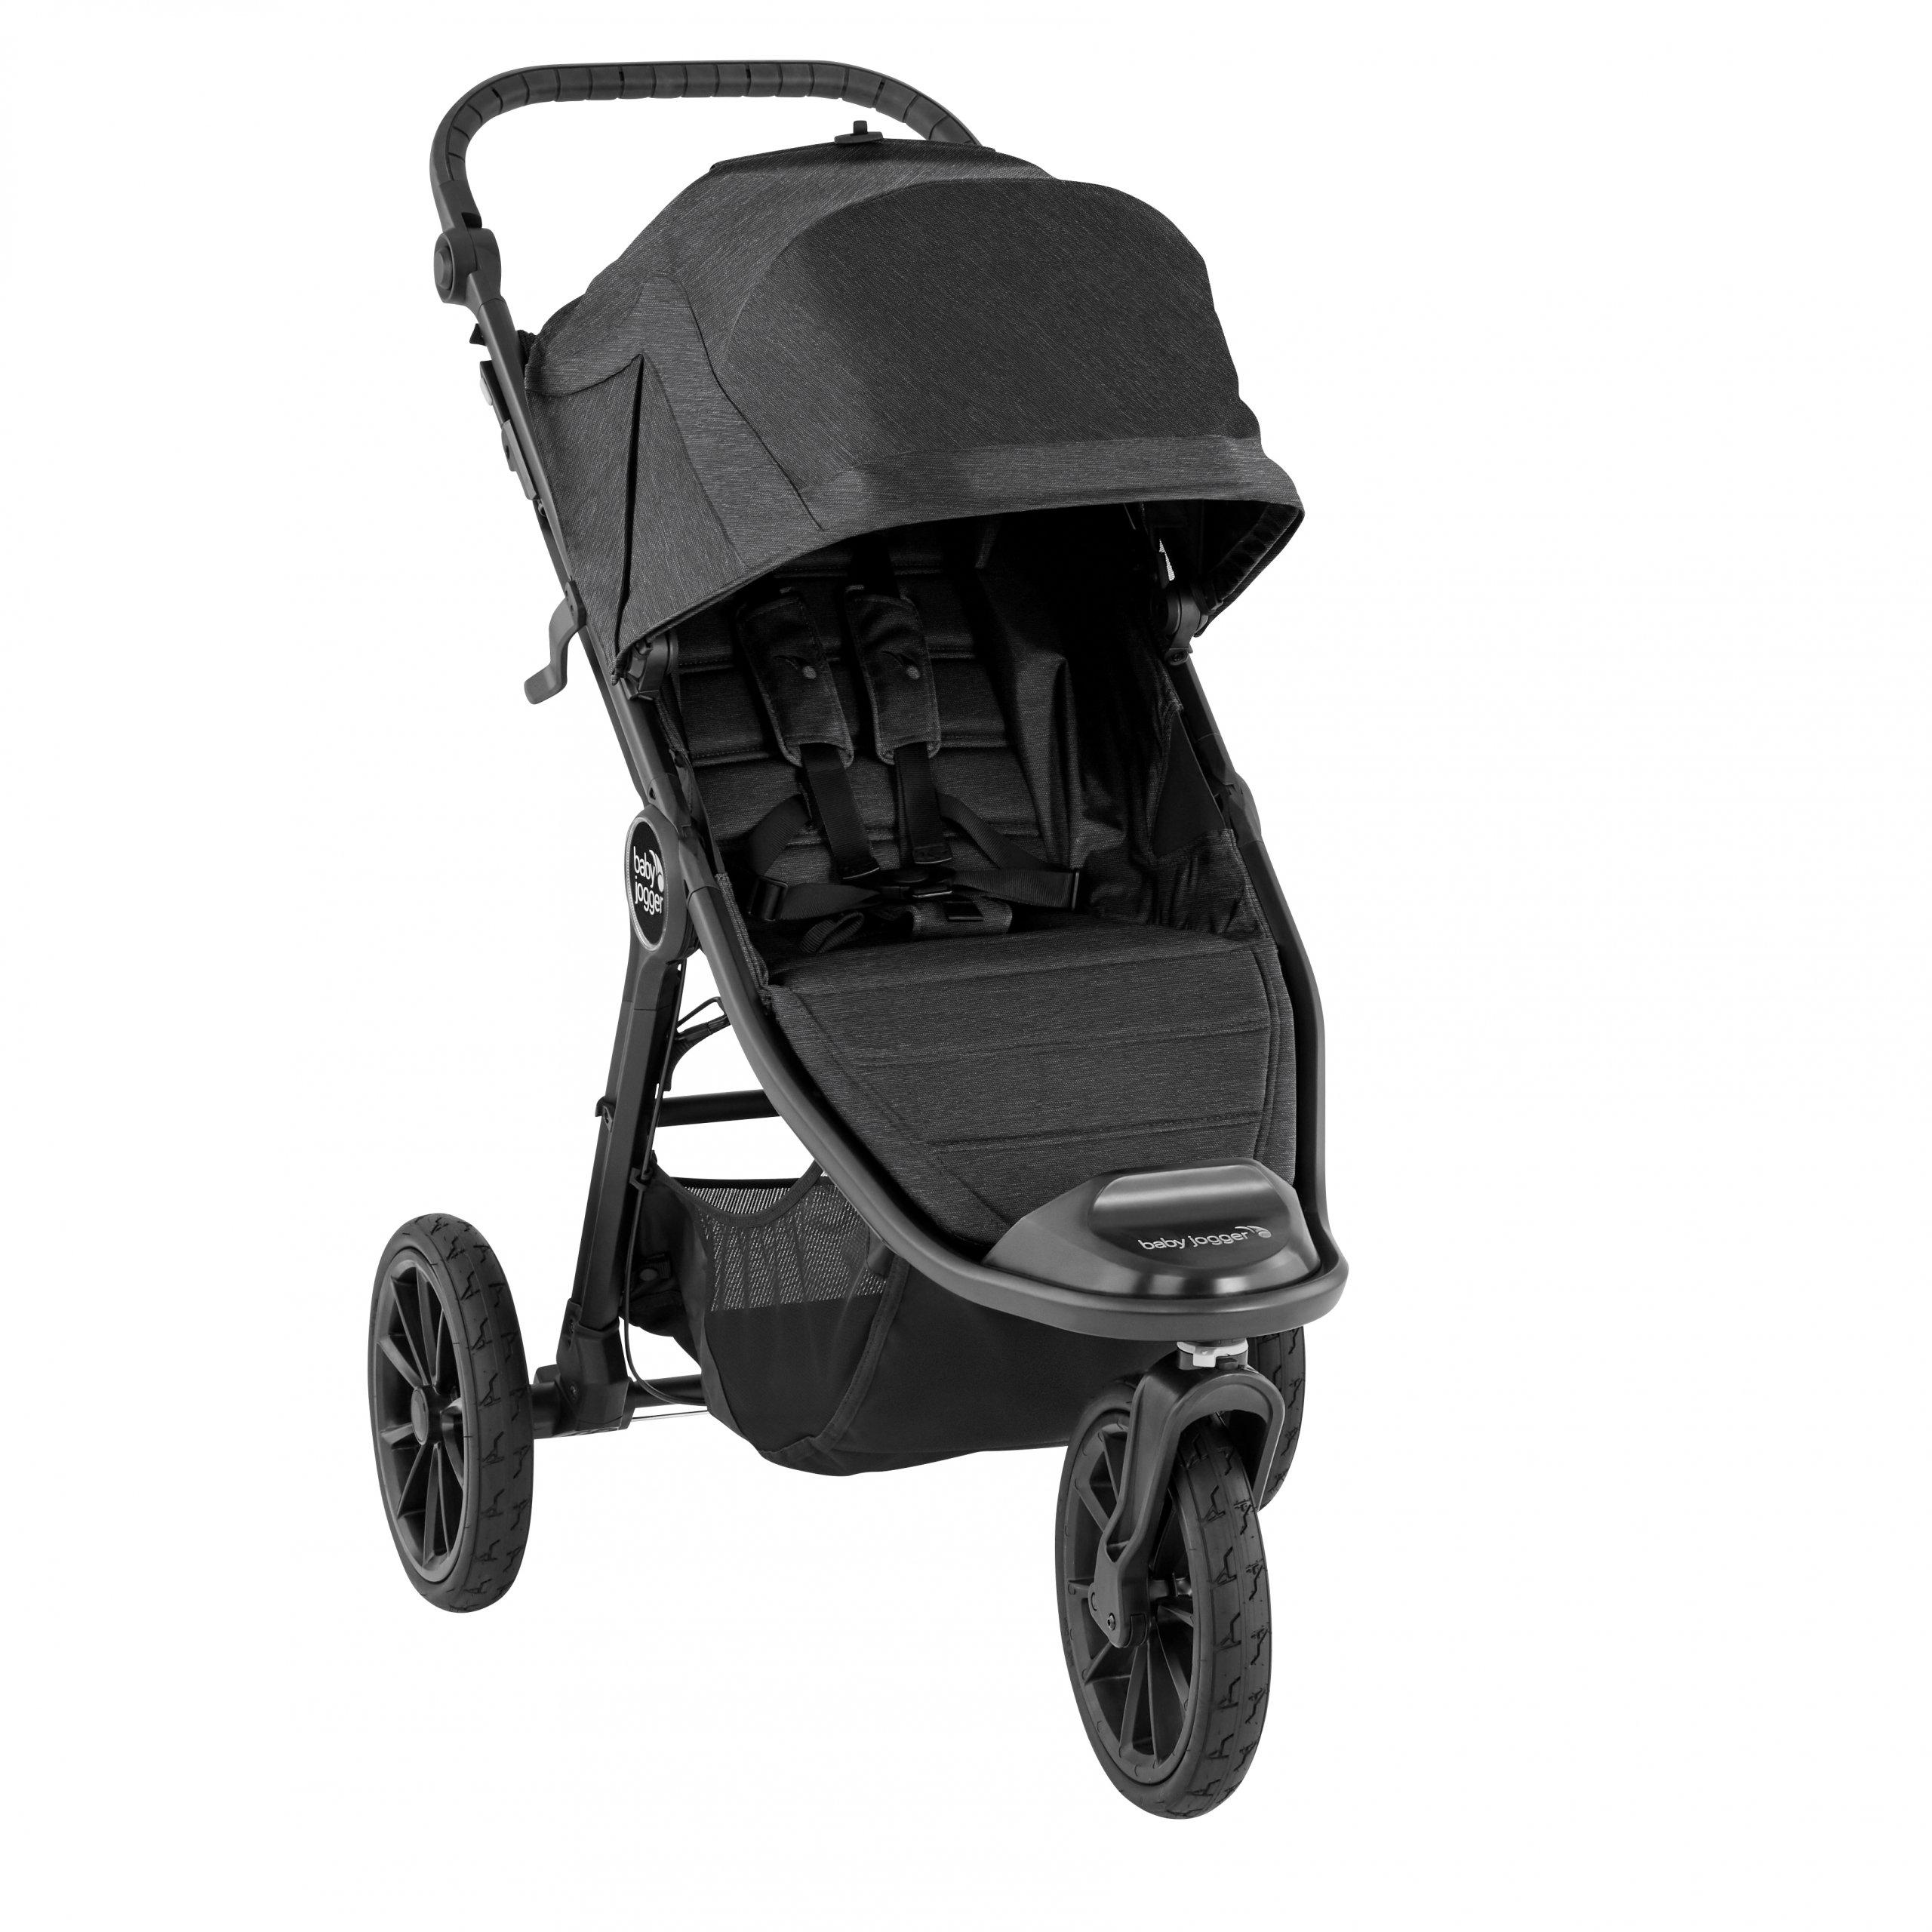 Baby Jogger City Elite 2 - Kinderwagen - Babyartikelcheck